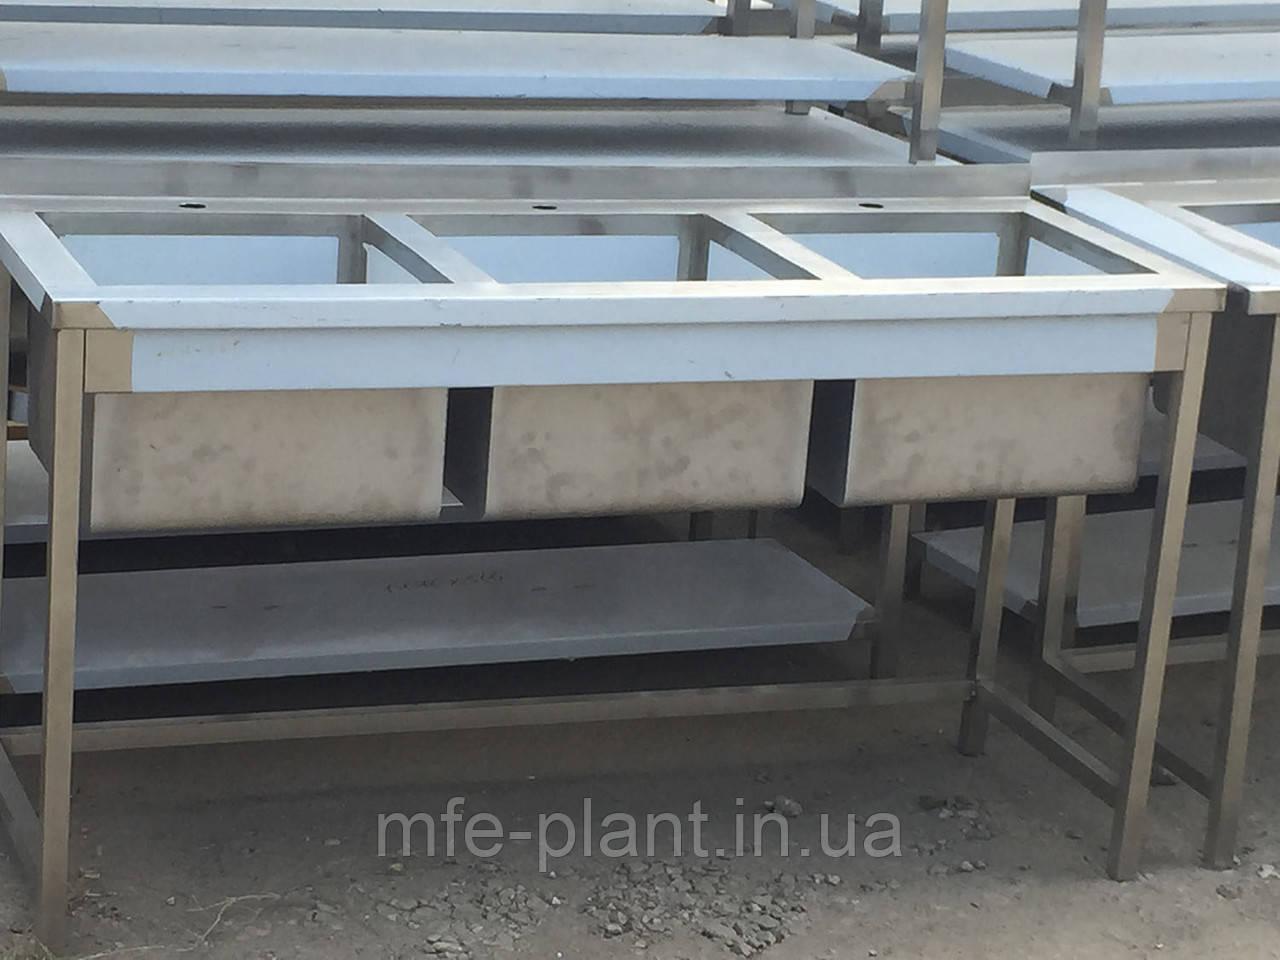 Мойка 3-секционная из нержавейки 1800х600х850 (гл. 300 мм)